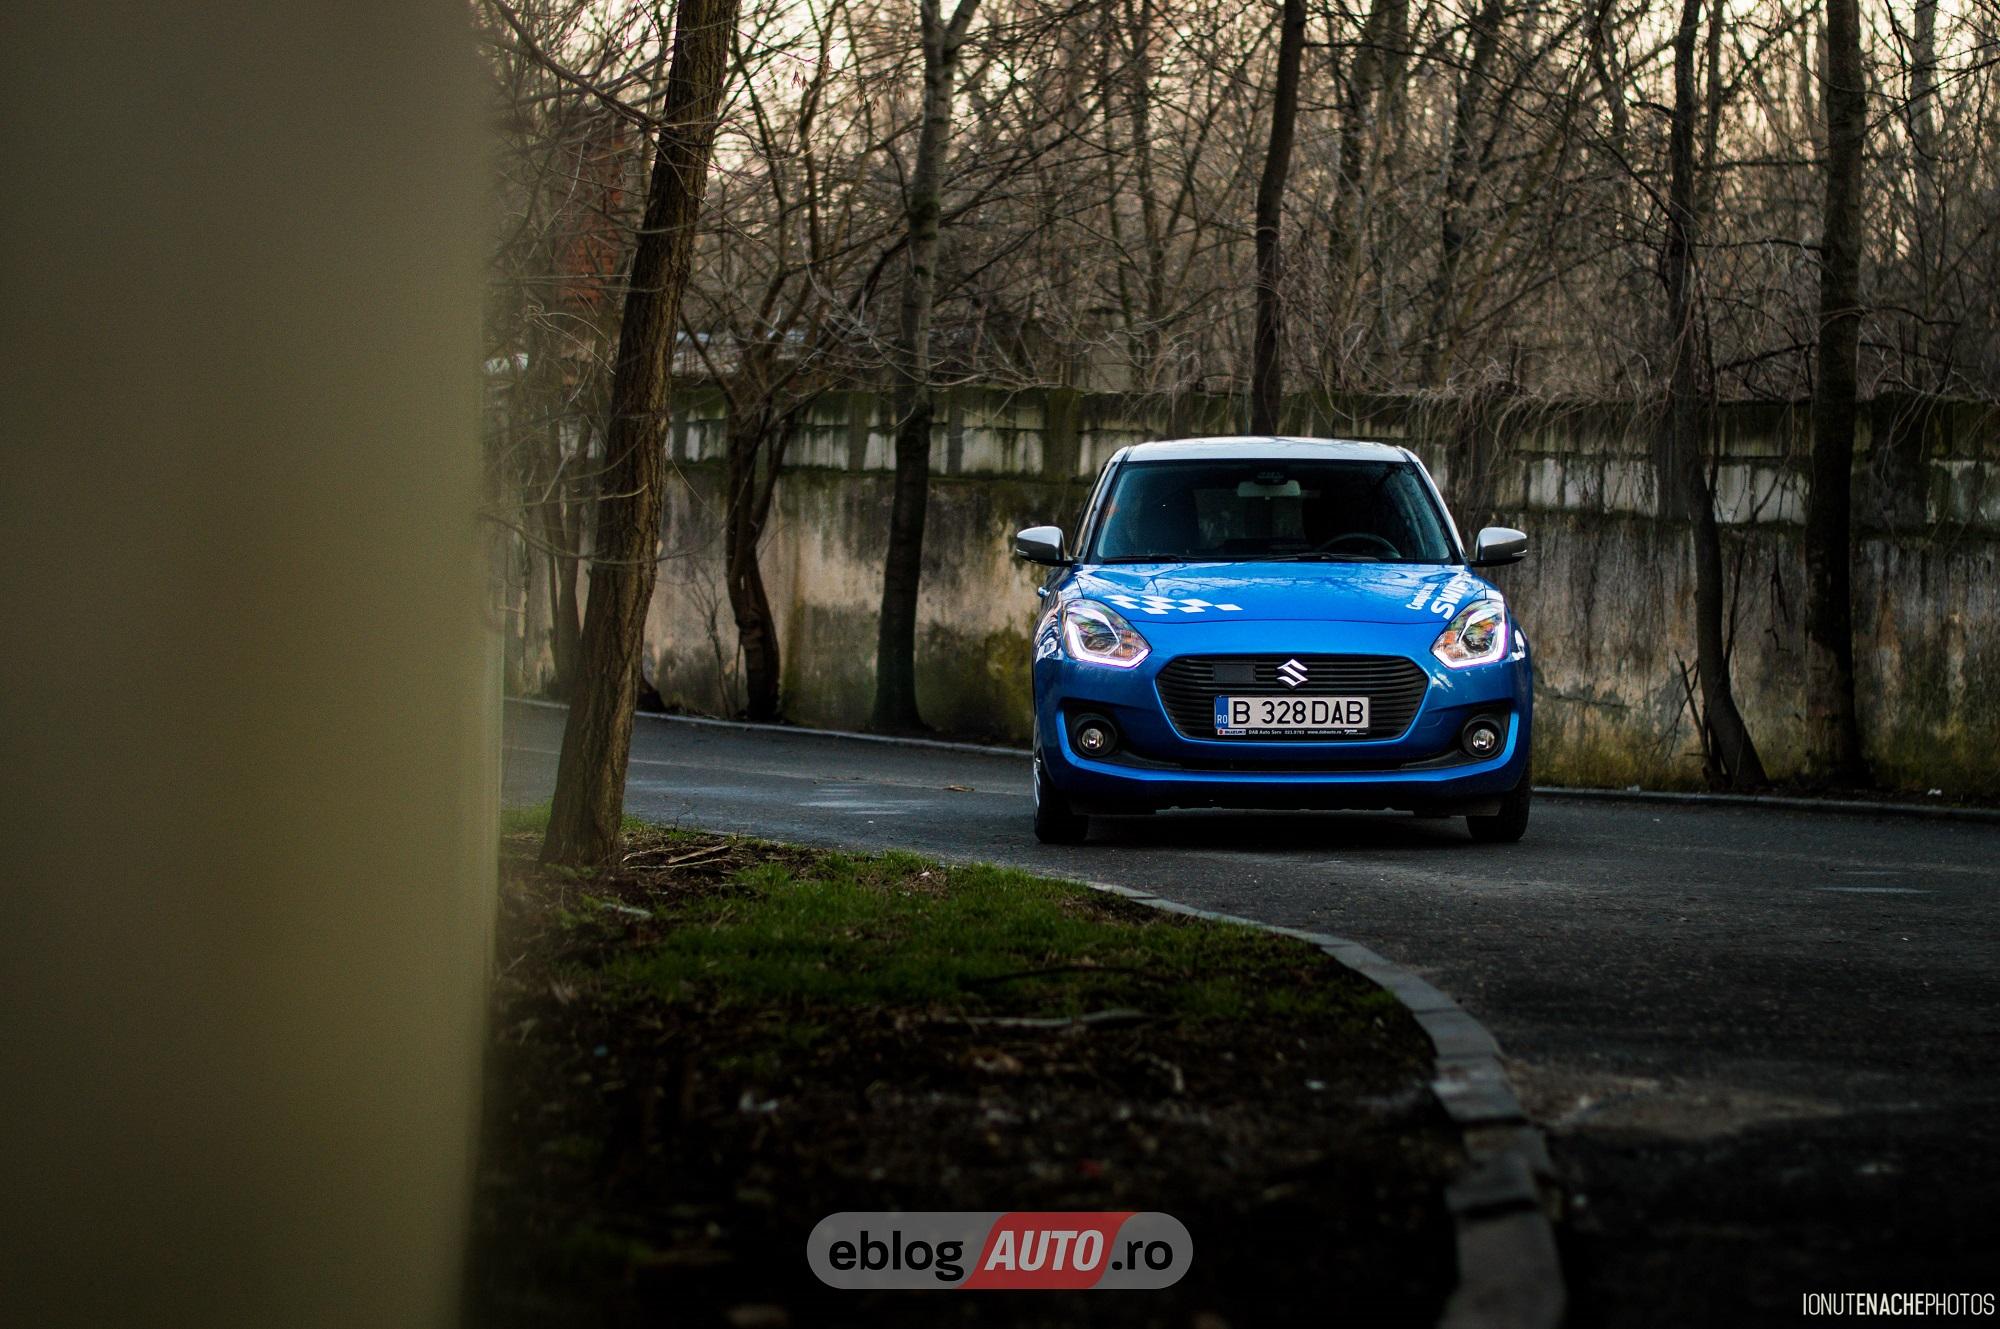 Test Drive Suzuki Swift 1.0 Boosterjet mild-hybrid 2018 [BONUS – VIDEO REVIEW]